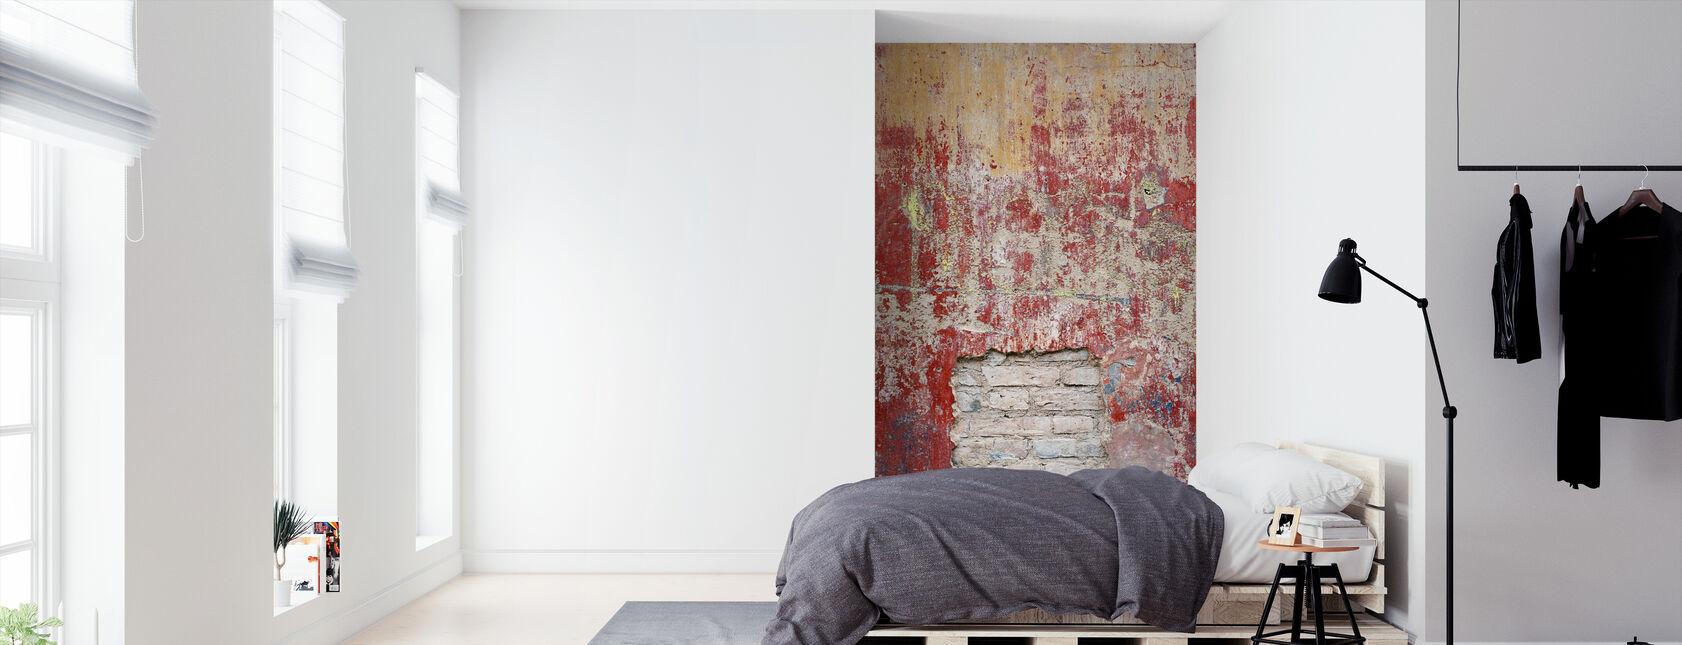 Reddish Old Cement Wall - Wallpaper - Bedroom